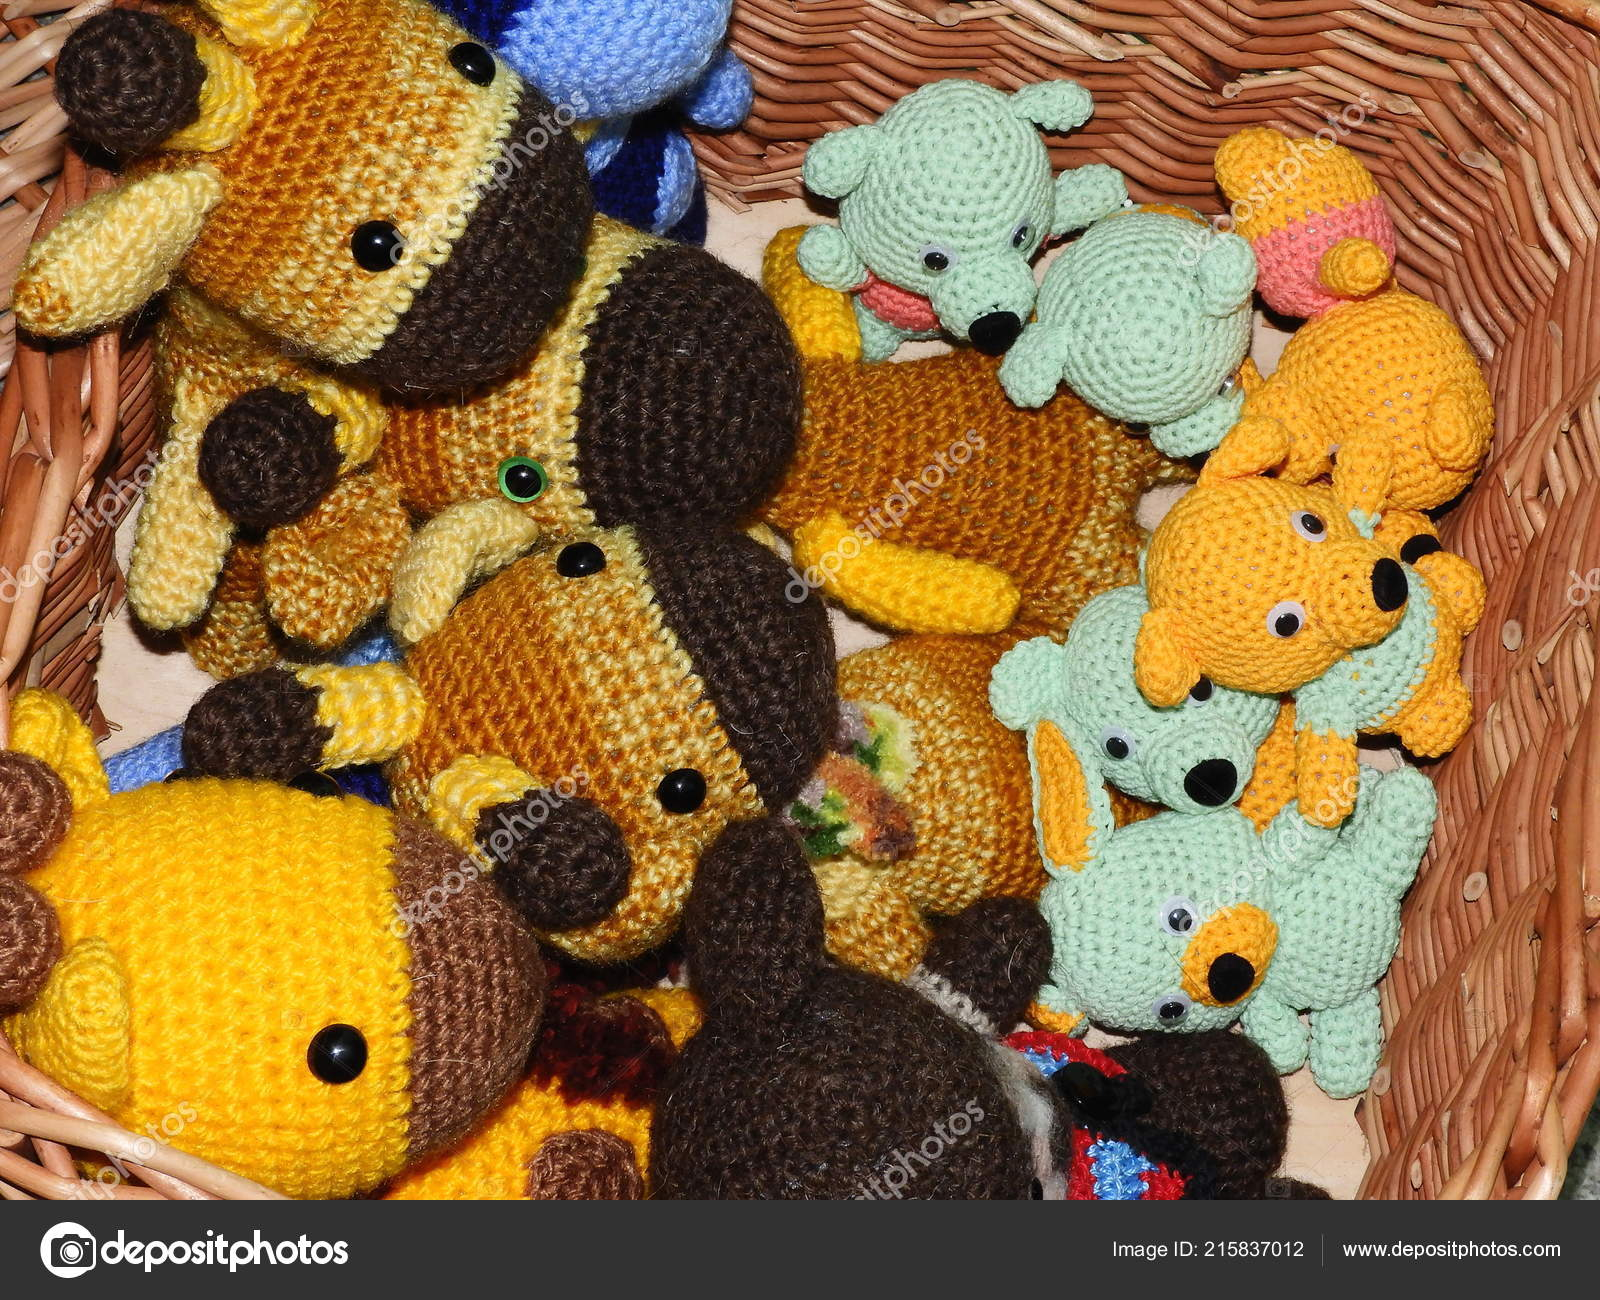 World Amigurumi Exhibition Volume 2 | Amigurumi, Kewpie, Kids events | 1300x1600